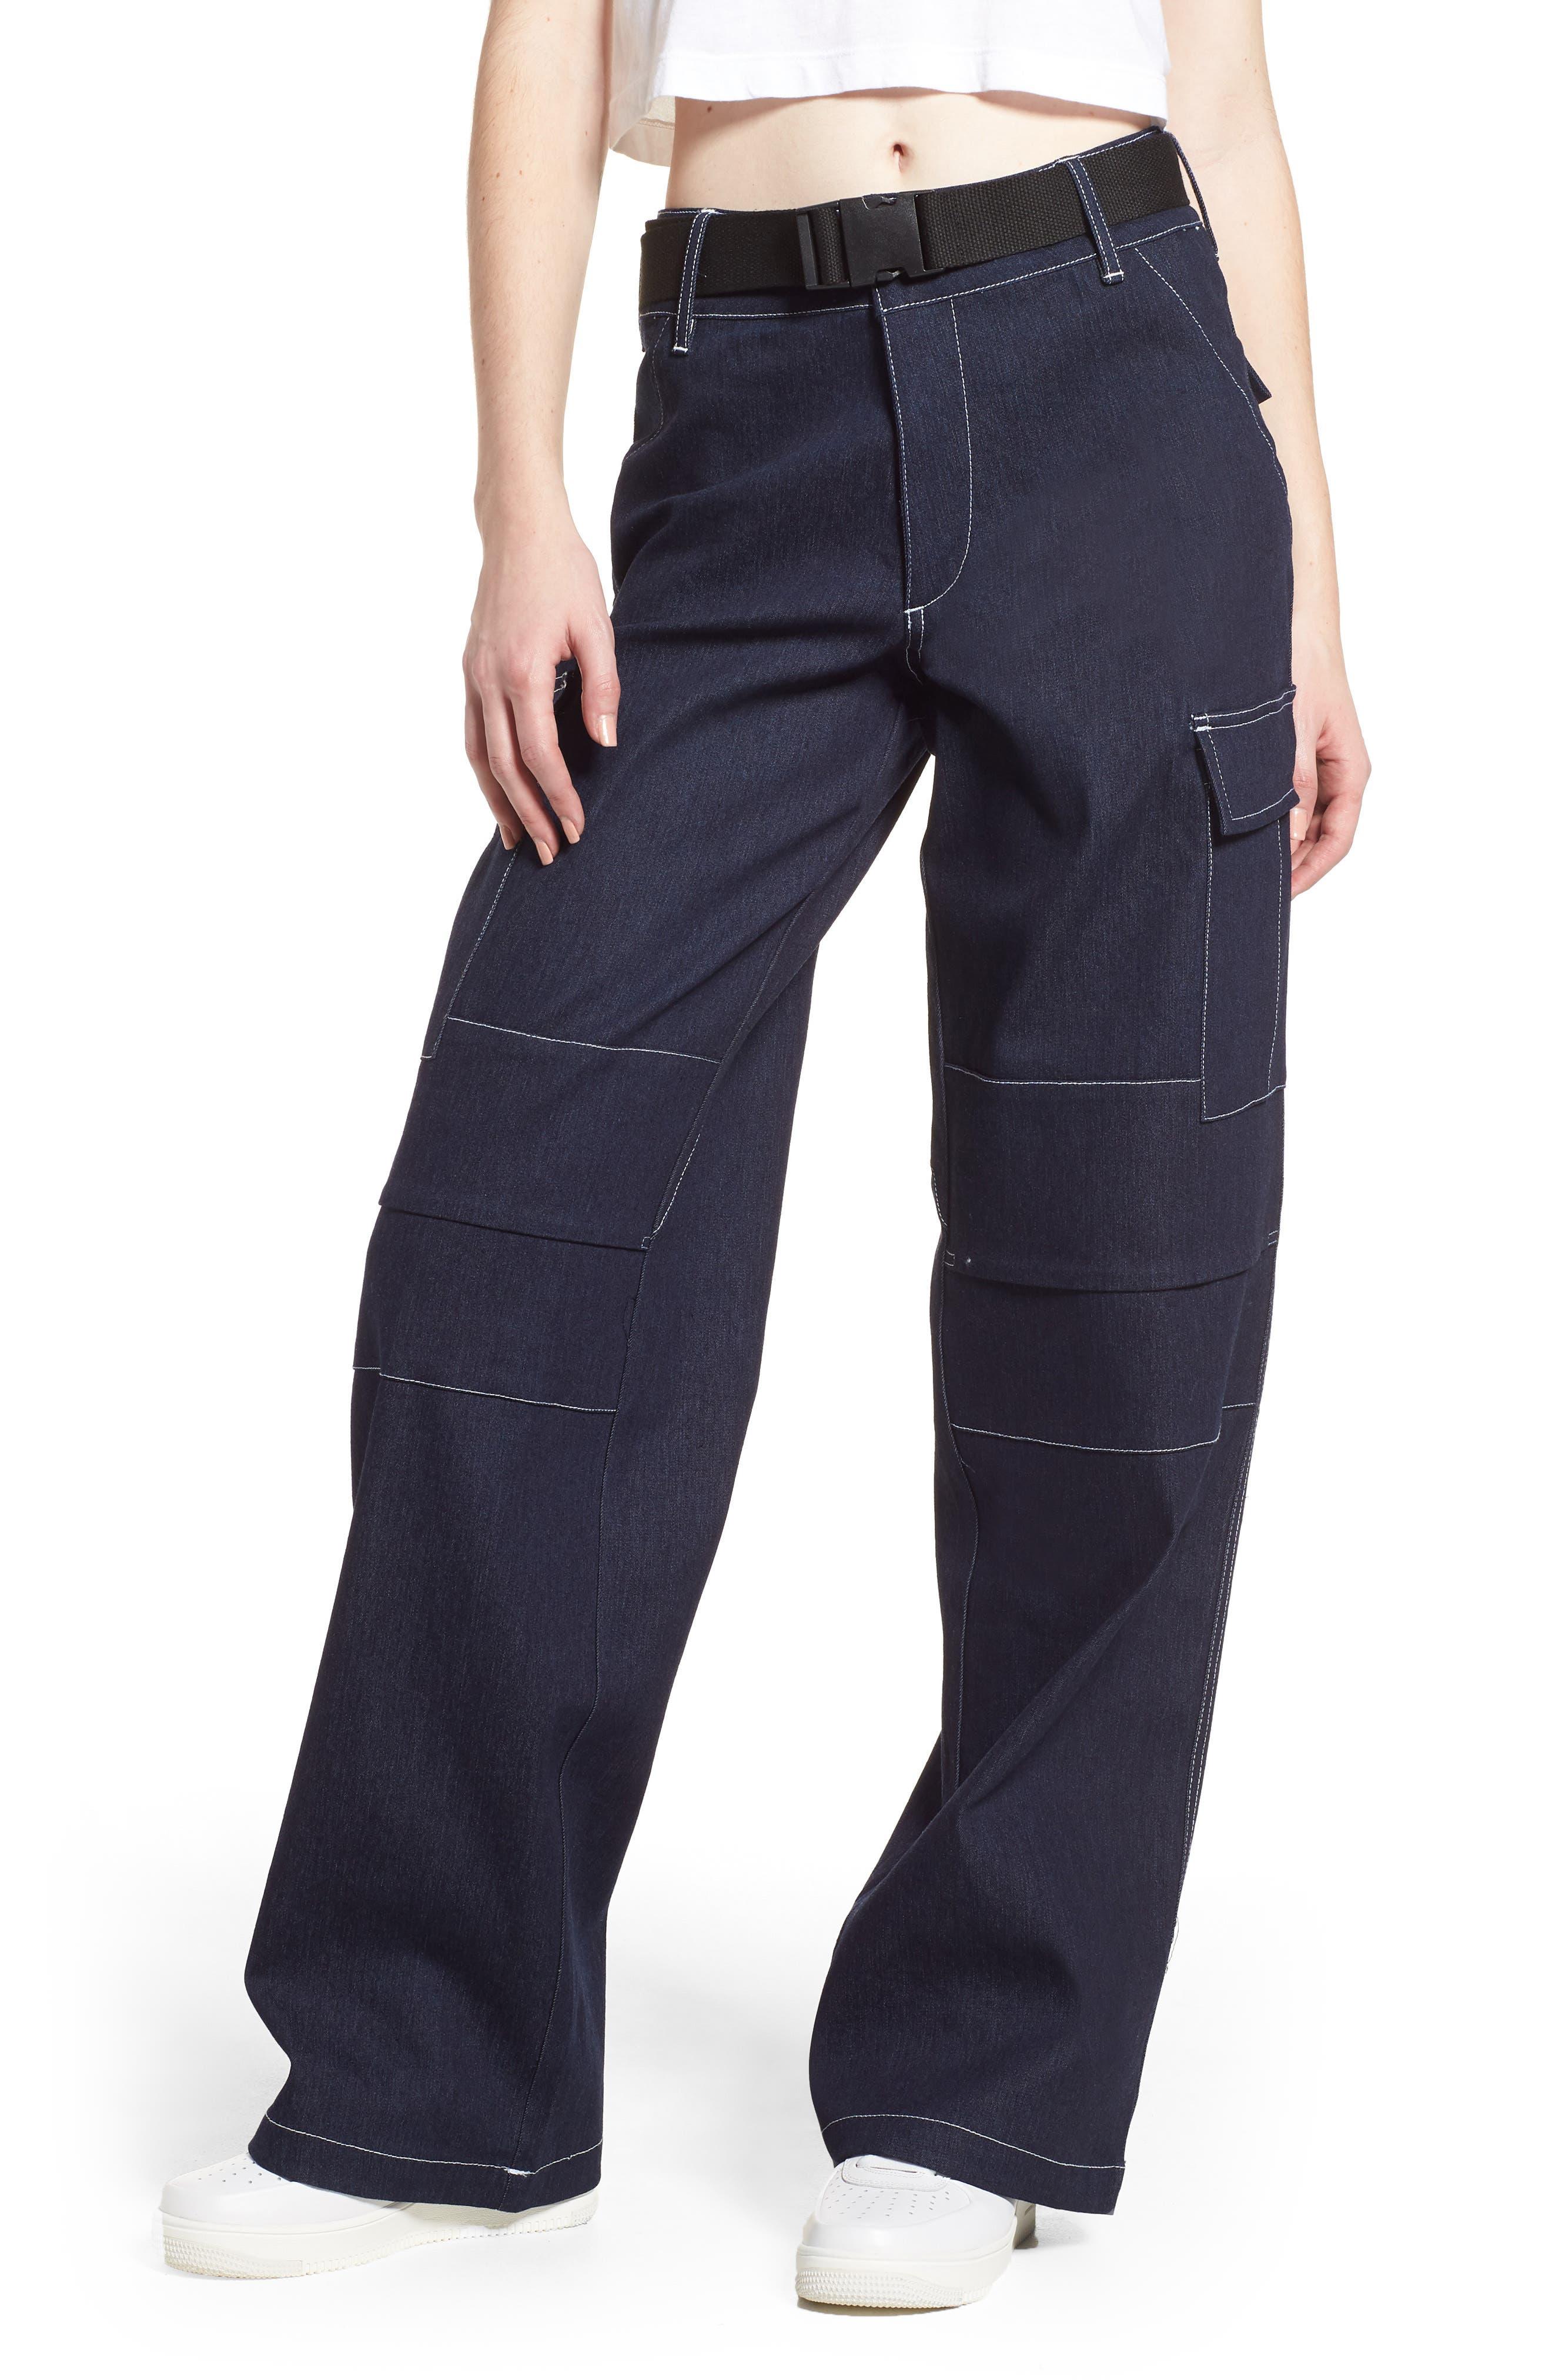 I.AM.GIA Ace Cargo Jeans,                             Main thumbnail 1, color,                             DENIM